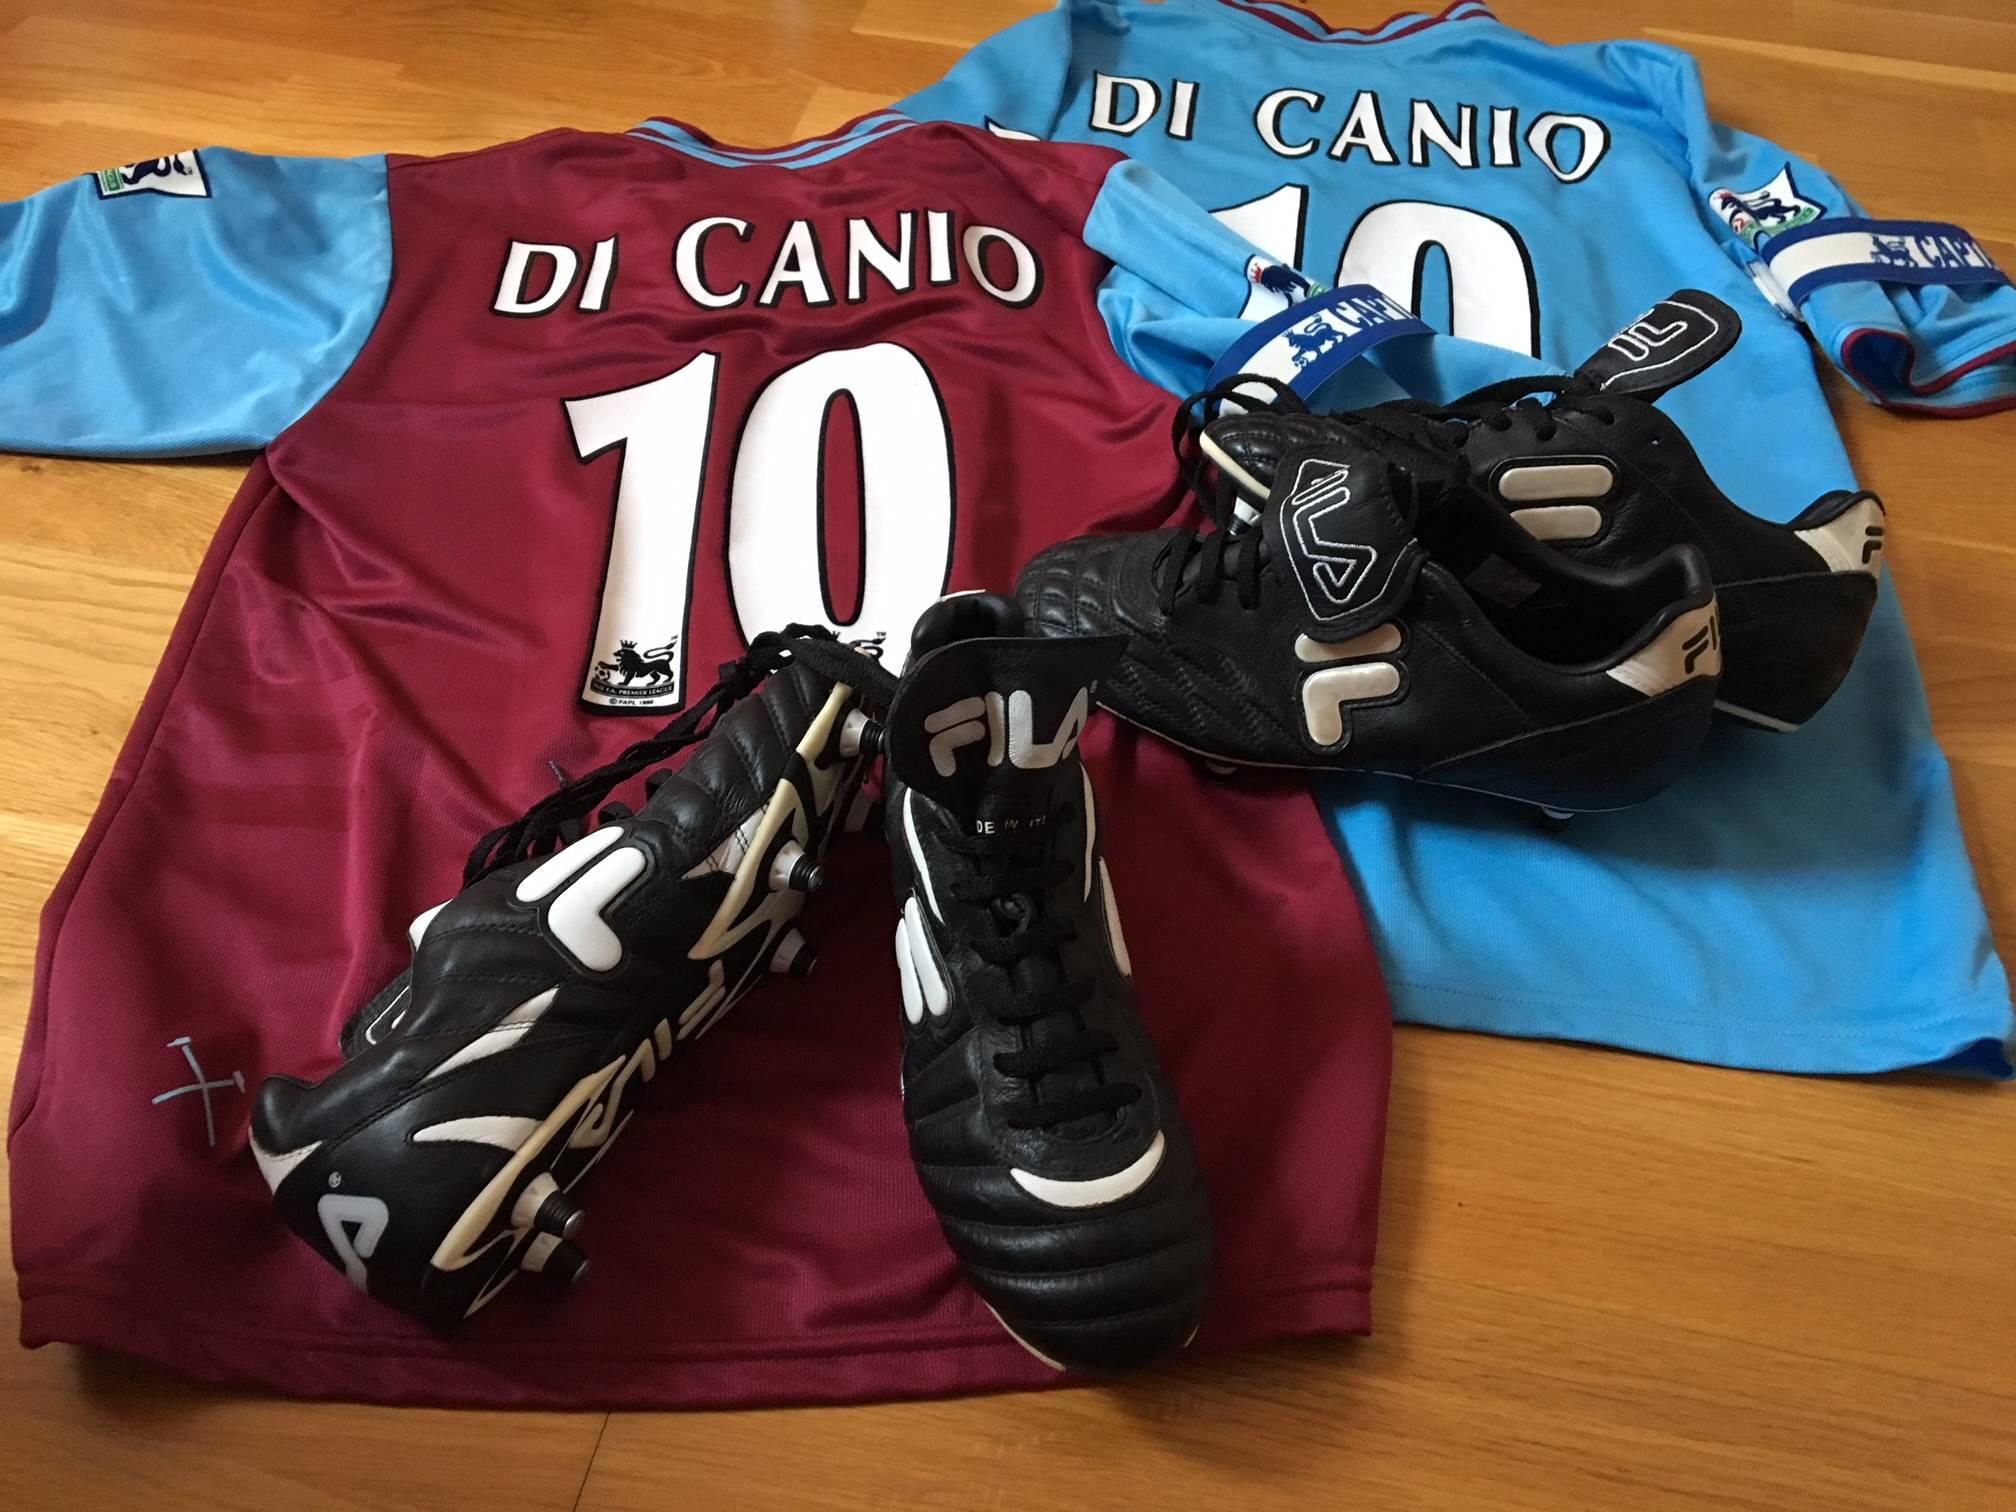 Paolo Di Canio worn 2001/03 worn shirts.